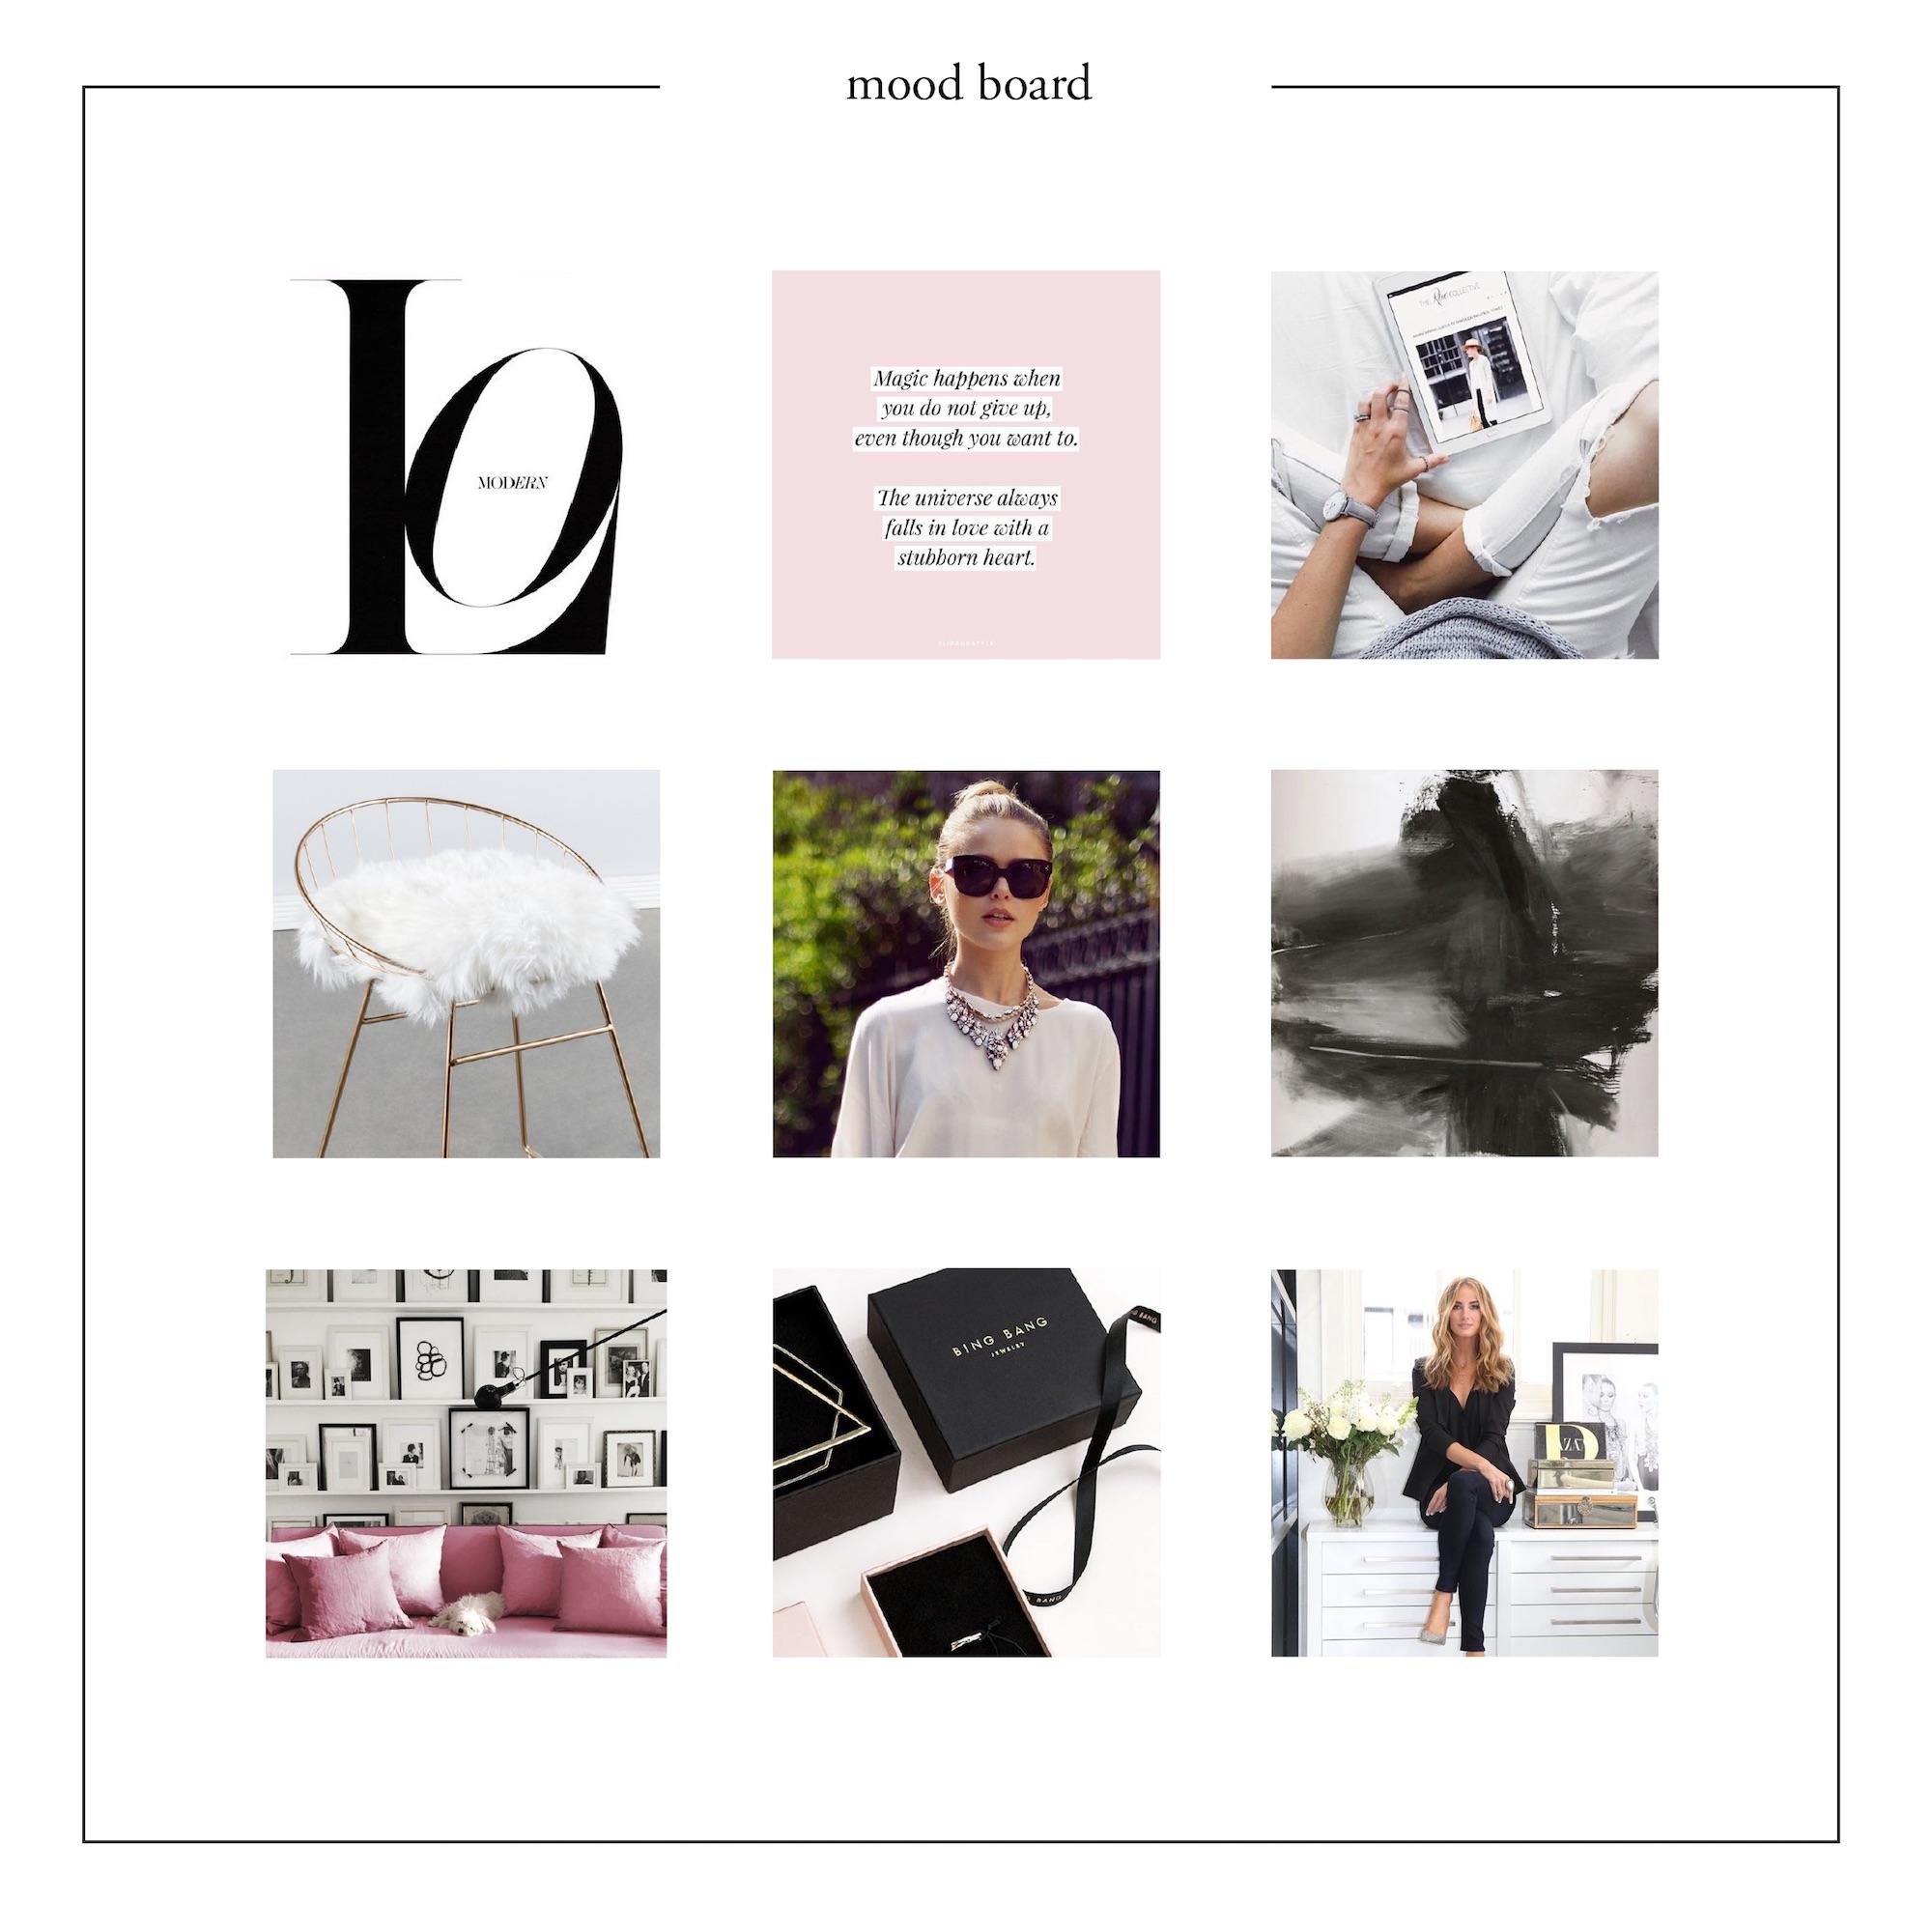 Mood & brand board